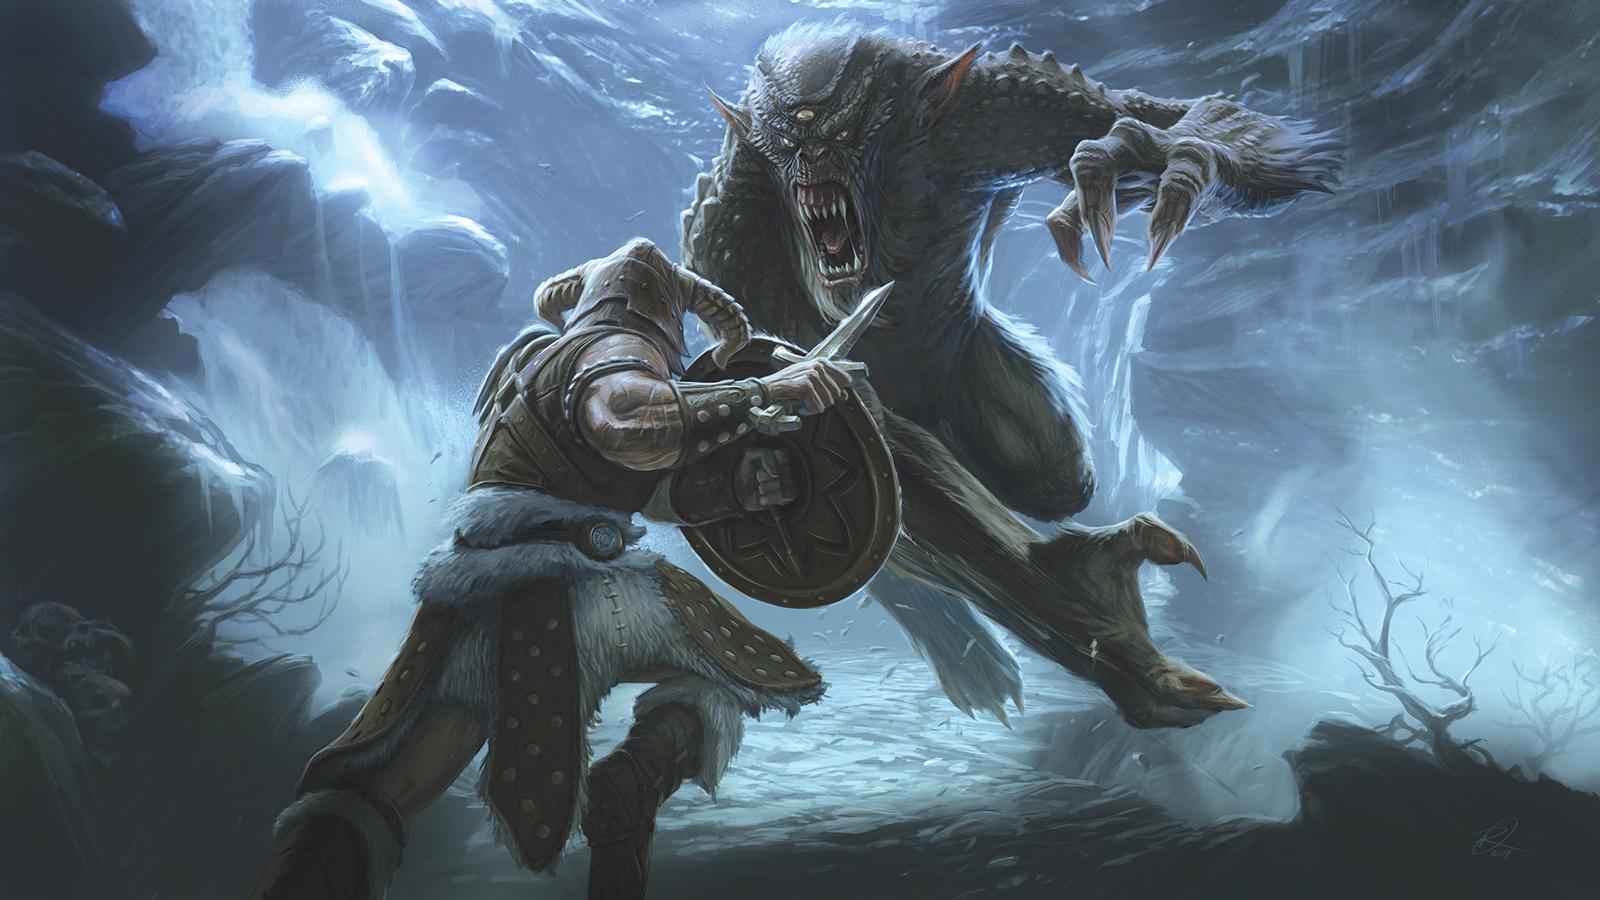 Skyrim Frost Troll Fight